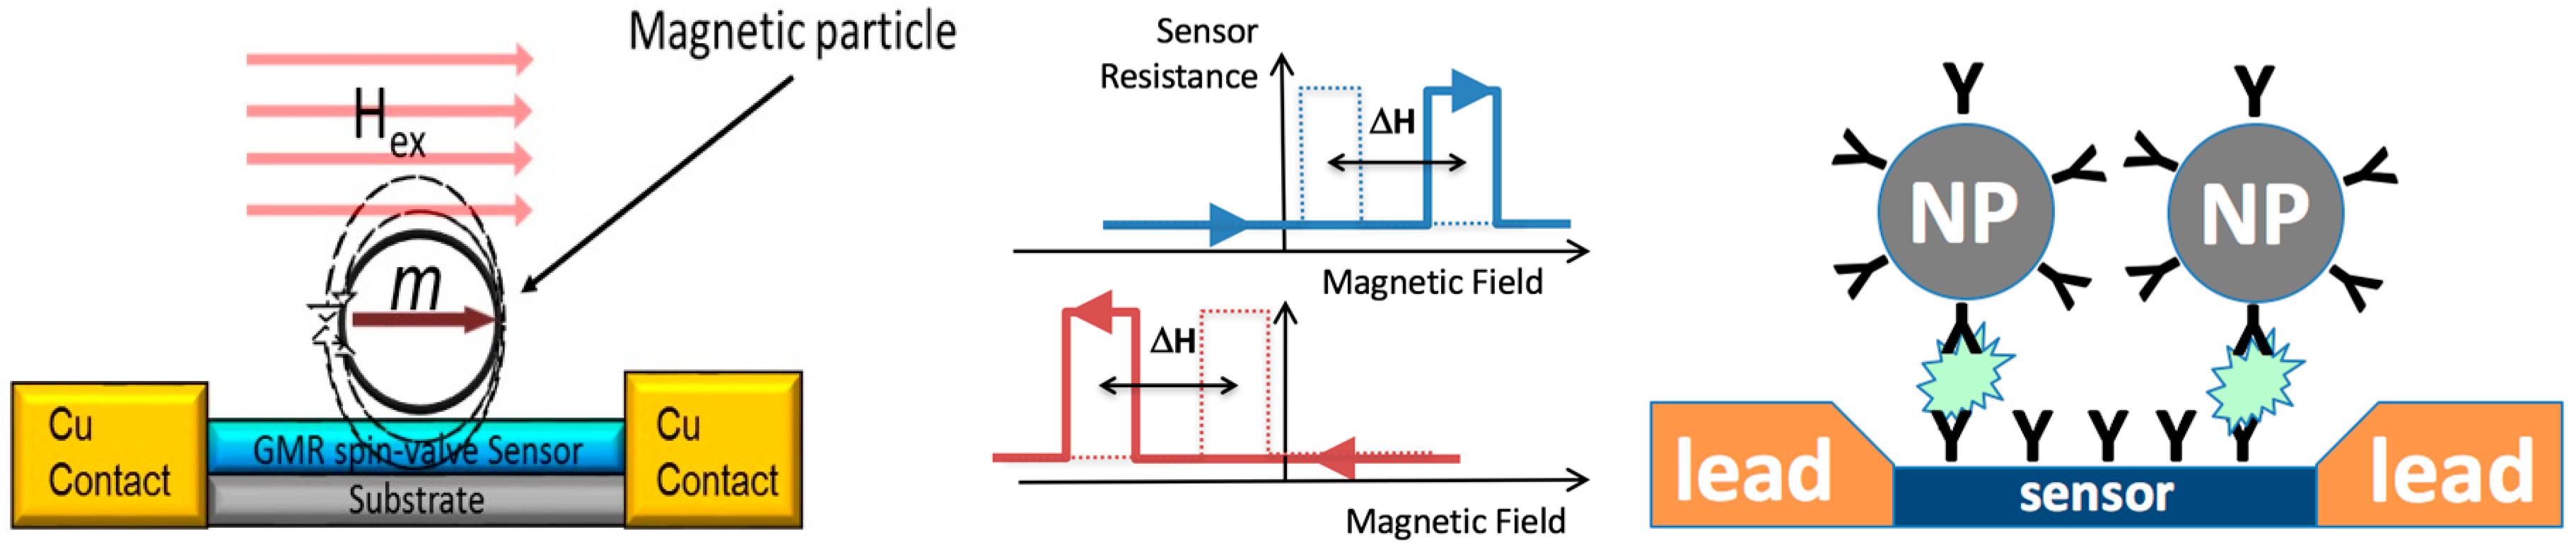 np np np sensor tester wiring diagram